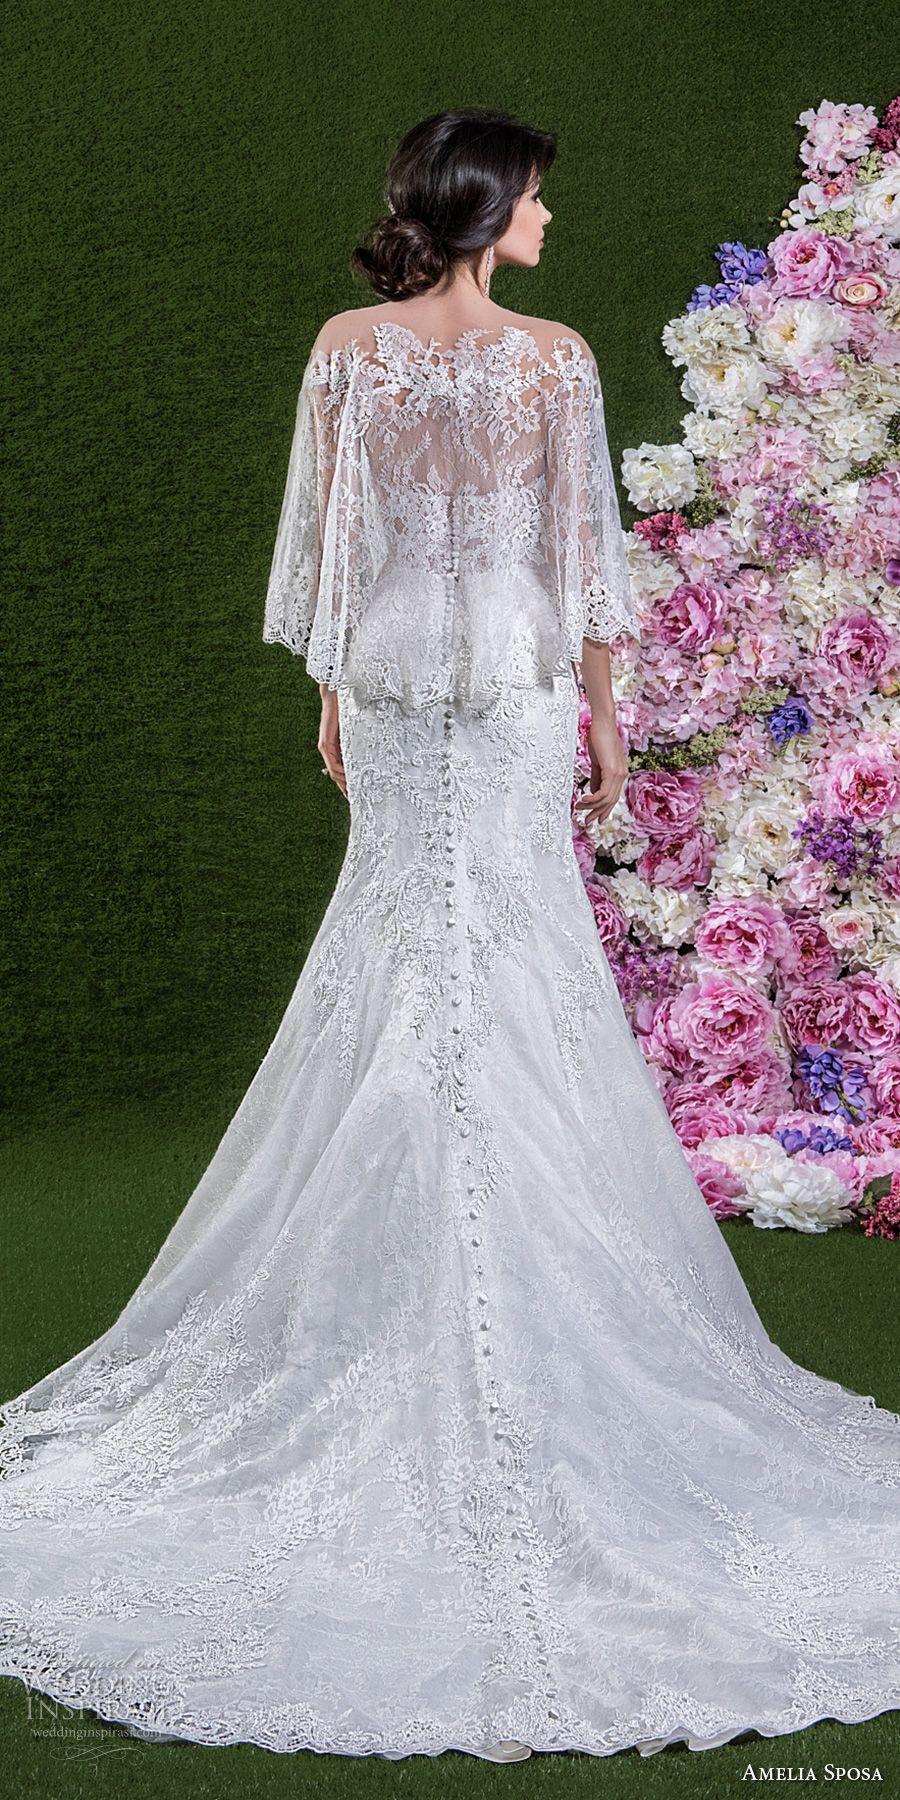 Amelia sposa wedding dresses amelia sposa mermaid wedding